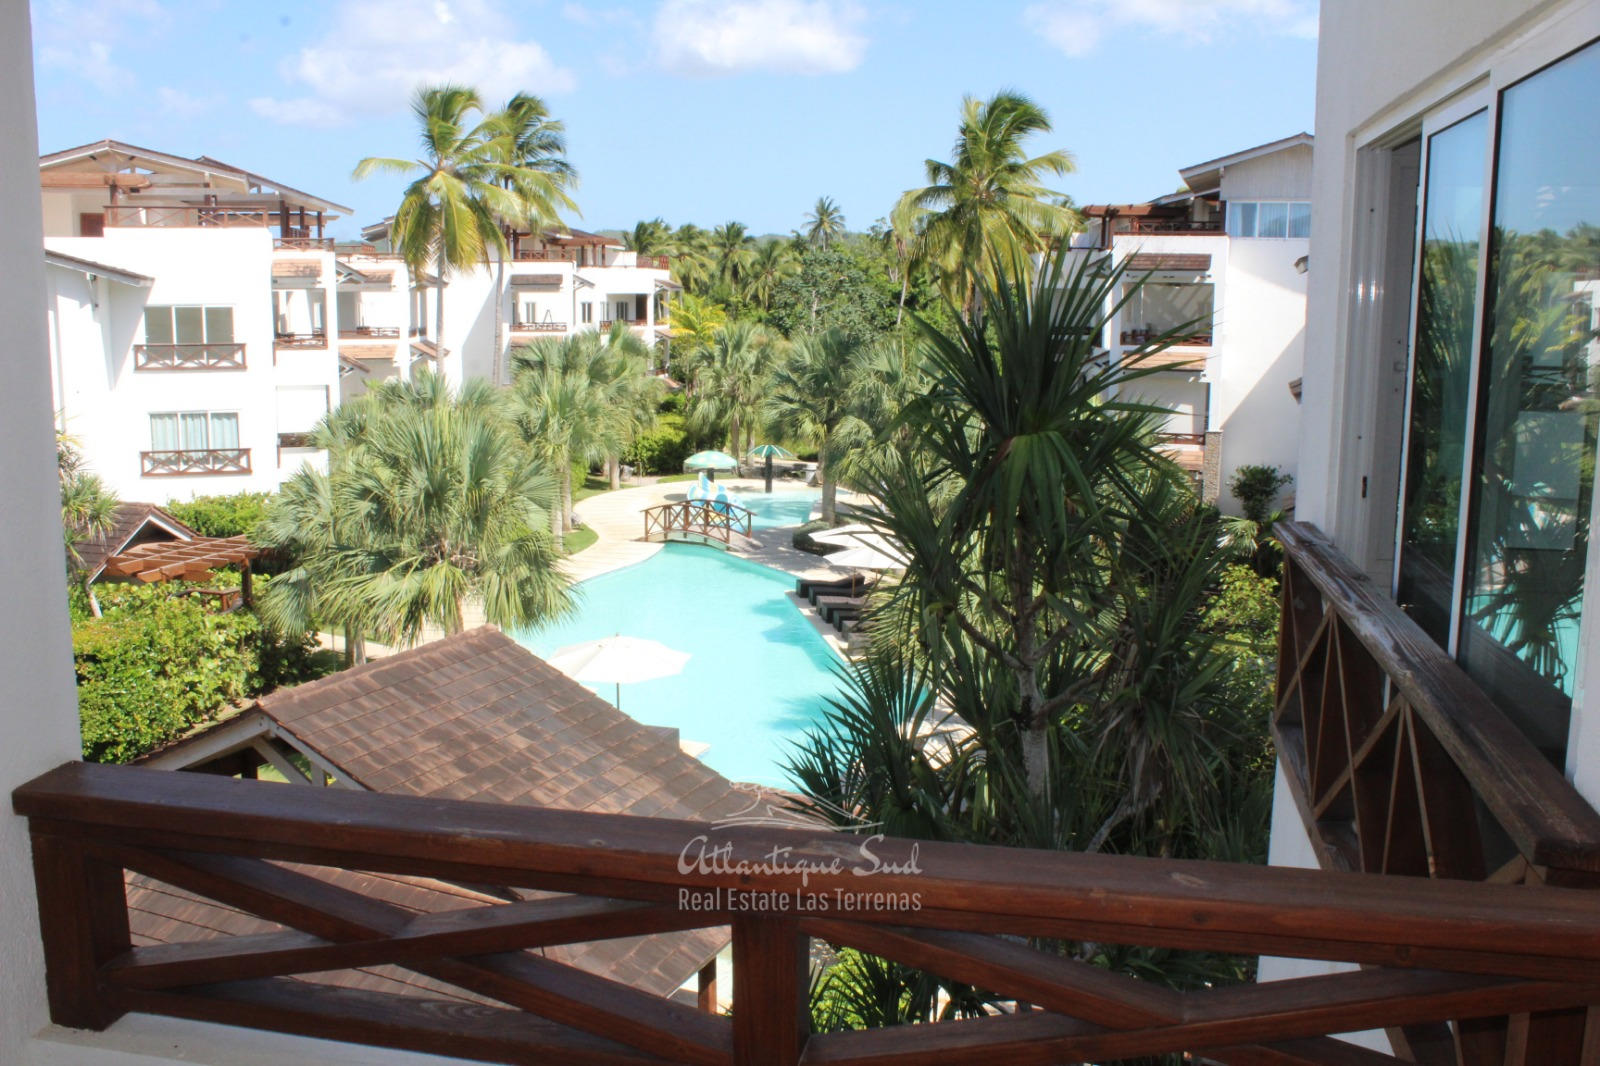 Apartments near the beach real estate las terrenas dominican republic 31 (6).jpg